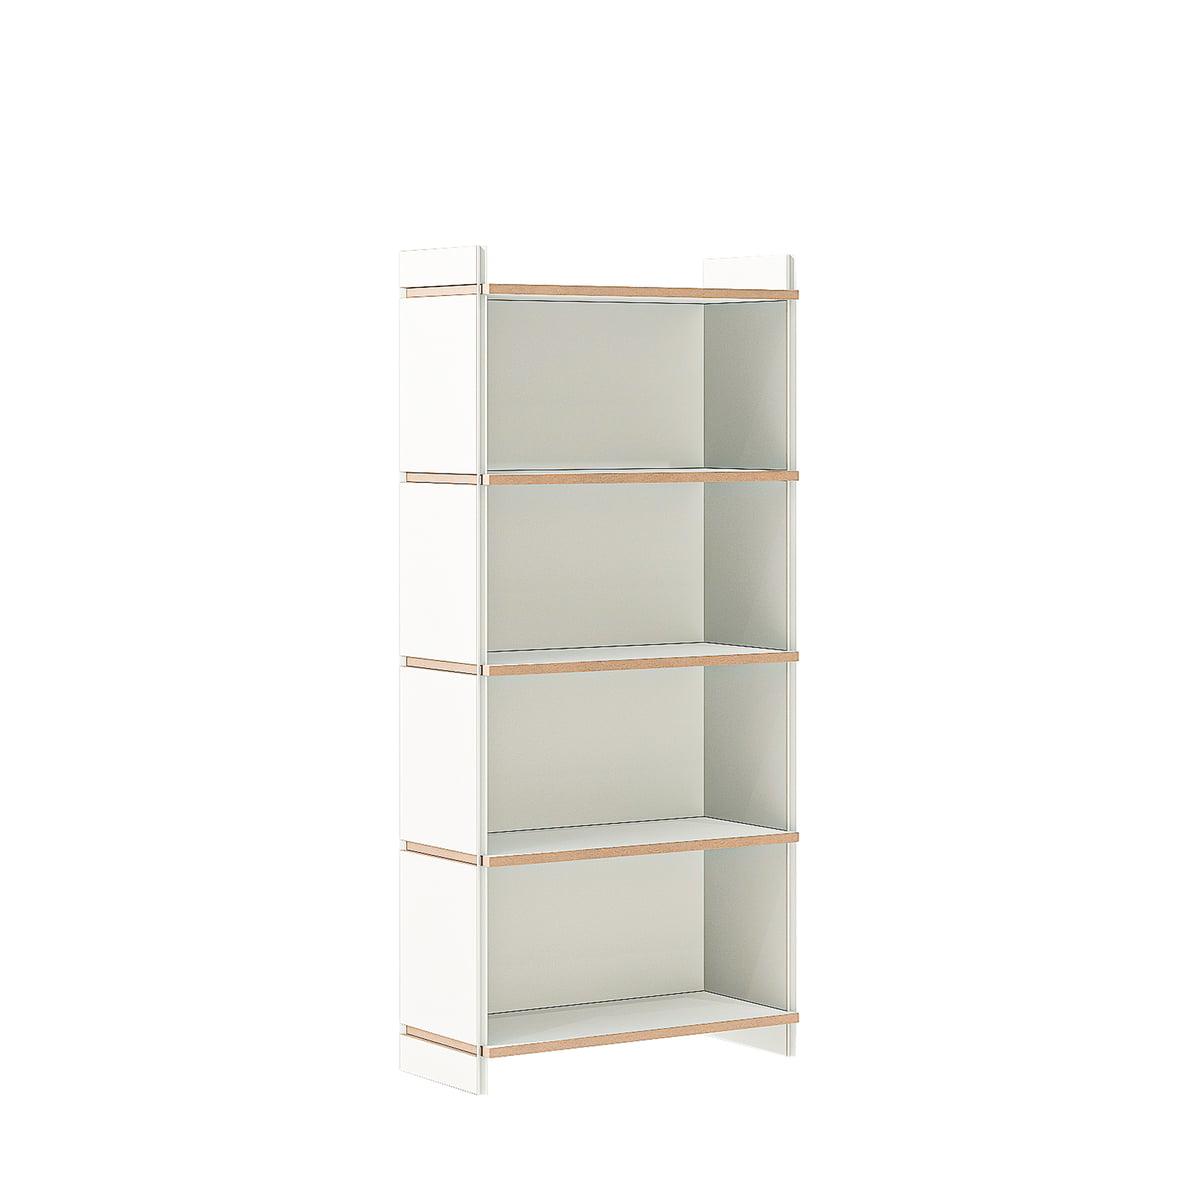 Oval Holz Display Sockel//Base/ /Gr/ö/ße 25/cm x 15/cm Mahagoni Farbe